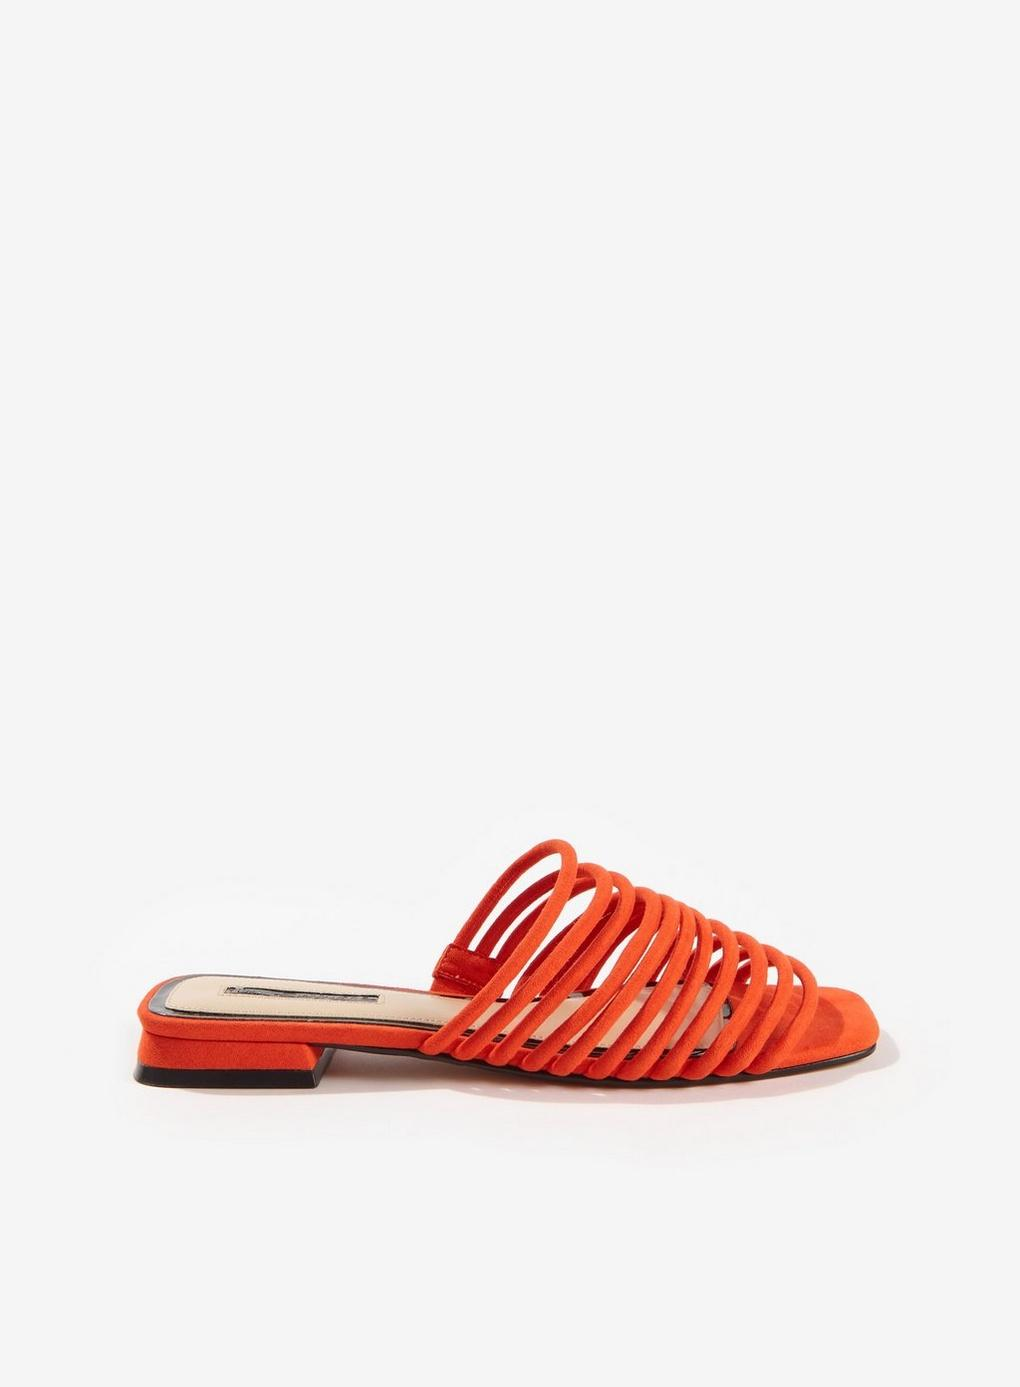 342b514dd9ab Miss Selfridge Eden Red Multi Strap Sandals in Red - Lyst